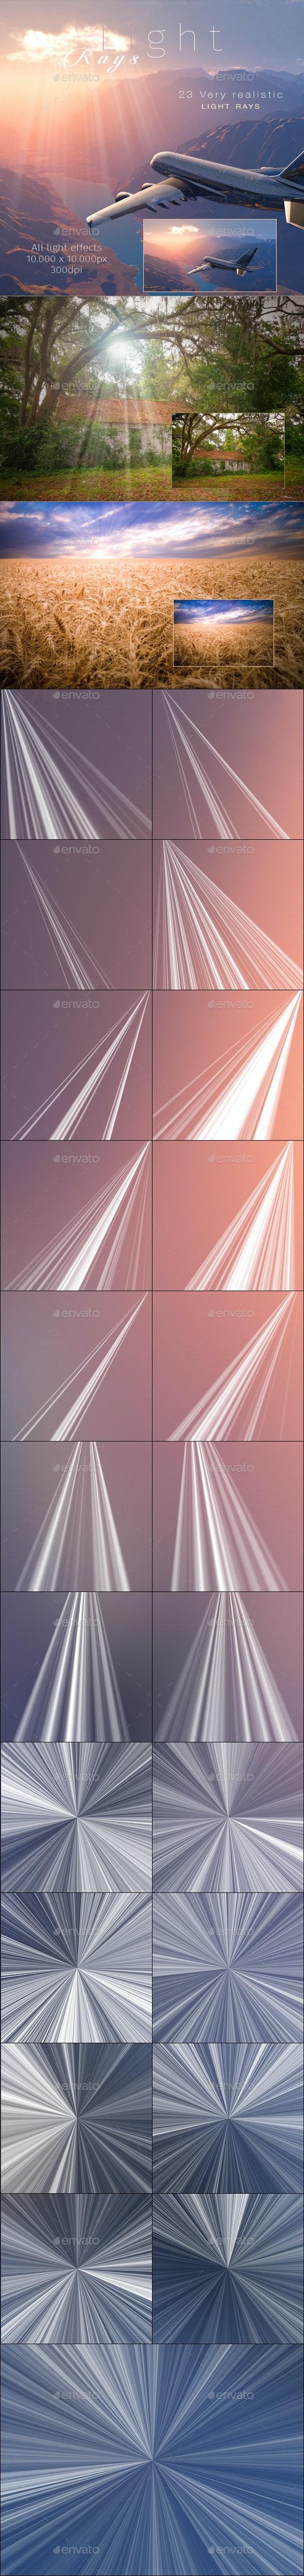 Light Rays - Sunburst - Decorative Graphics